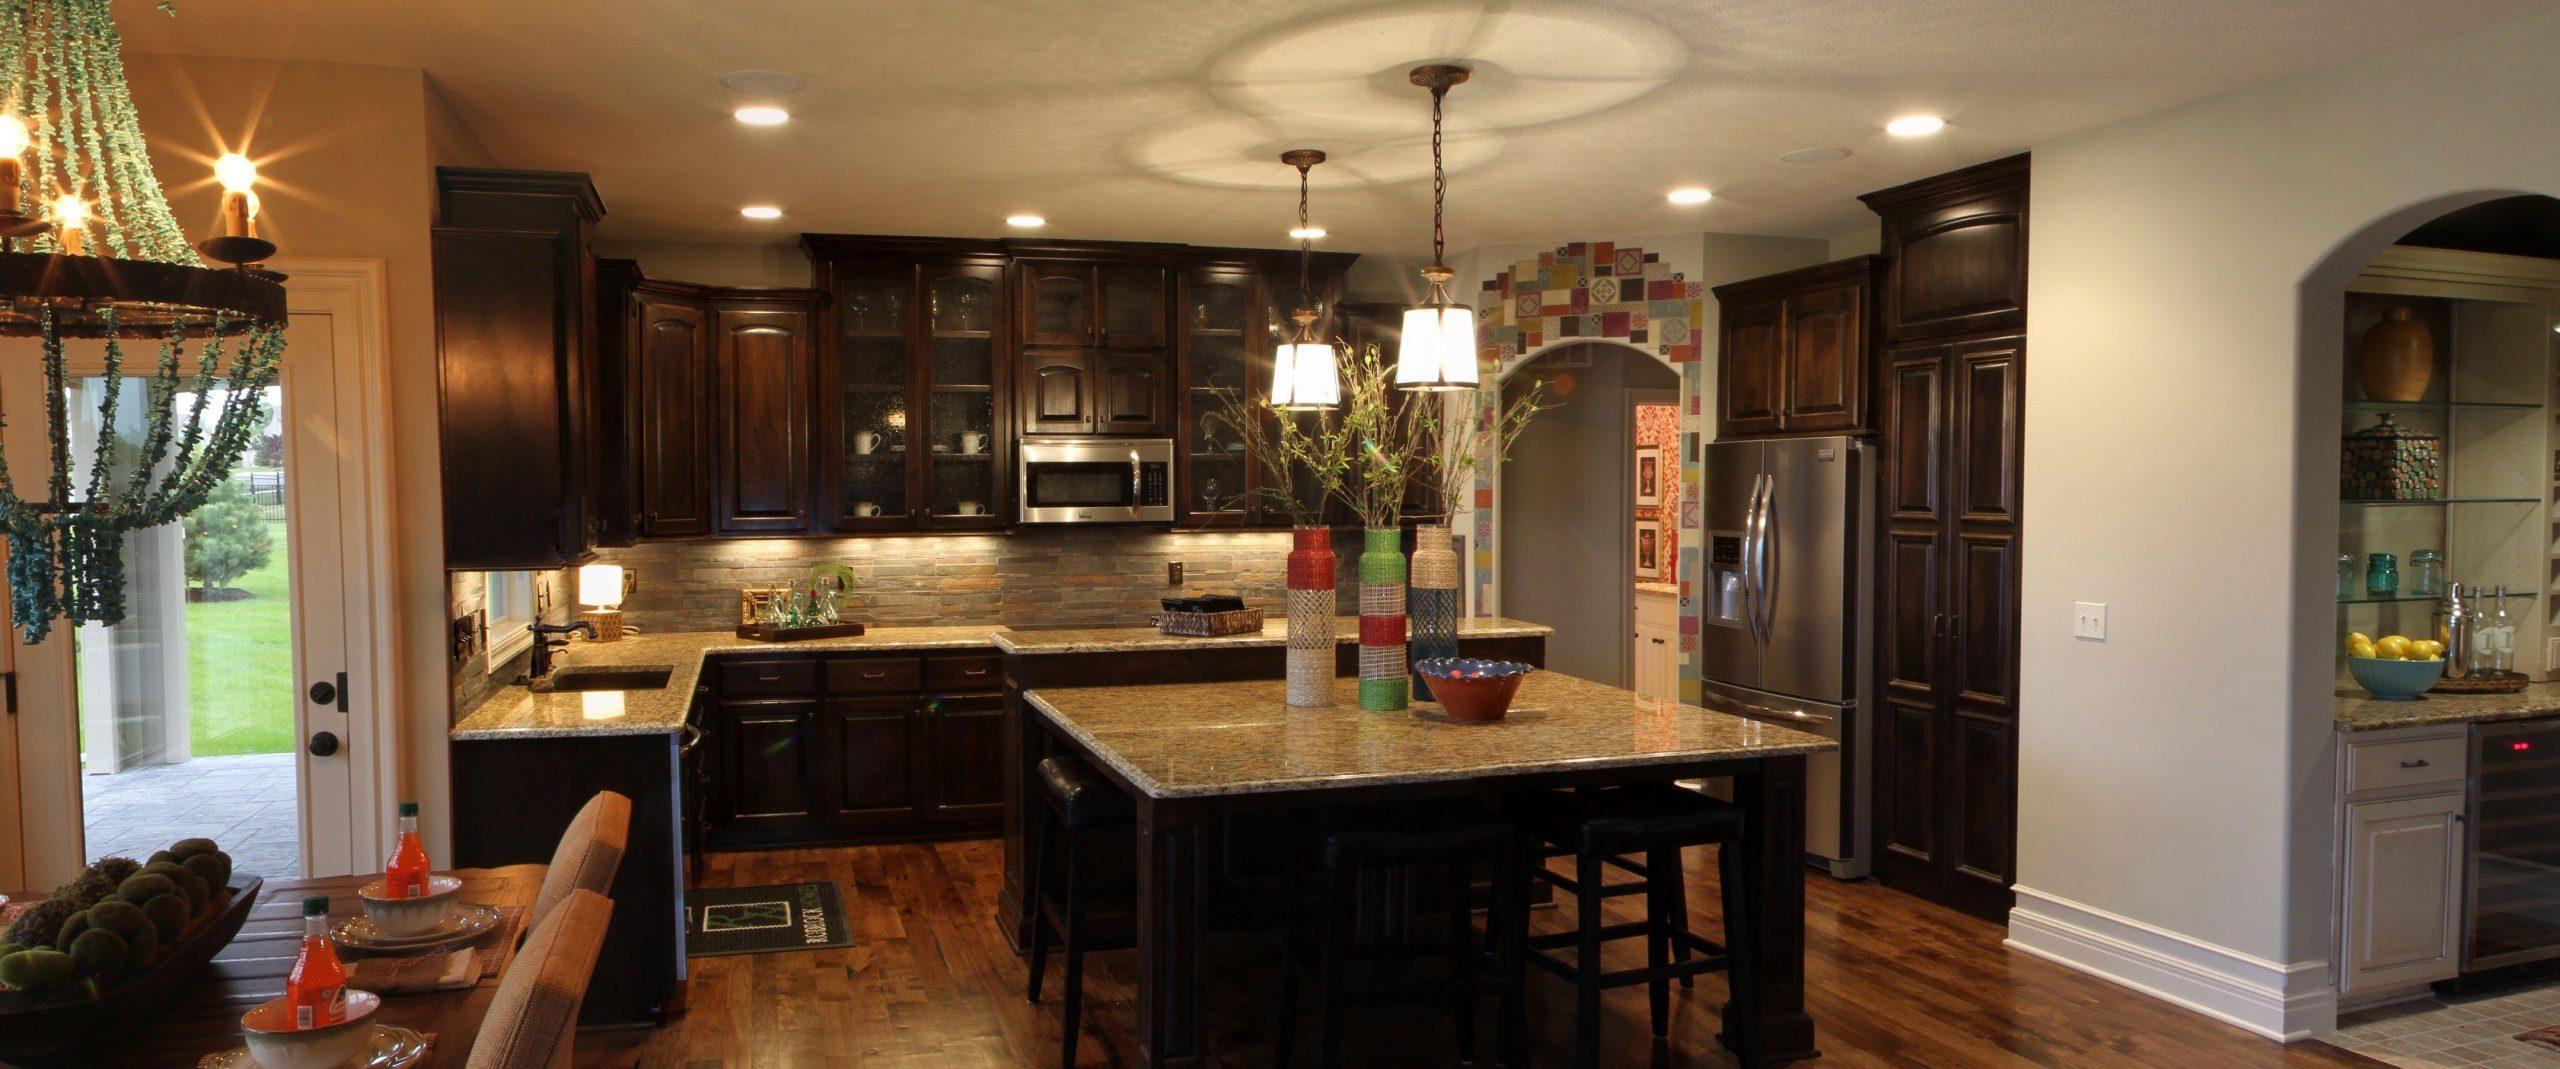 house interior design models Home Design 16+ House Interior Design Models PNG